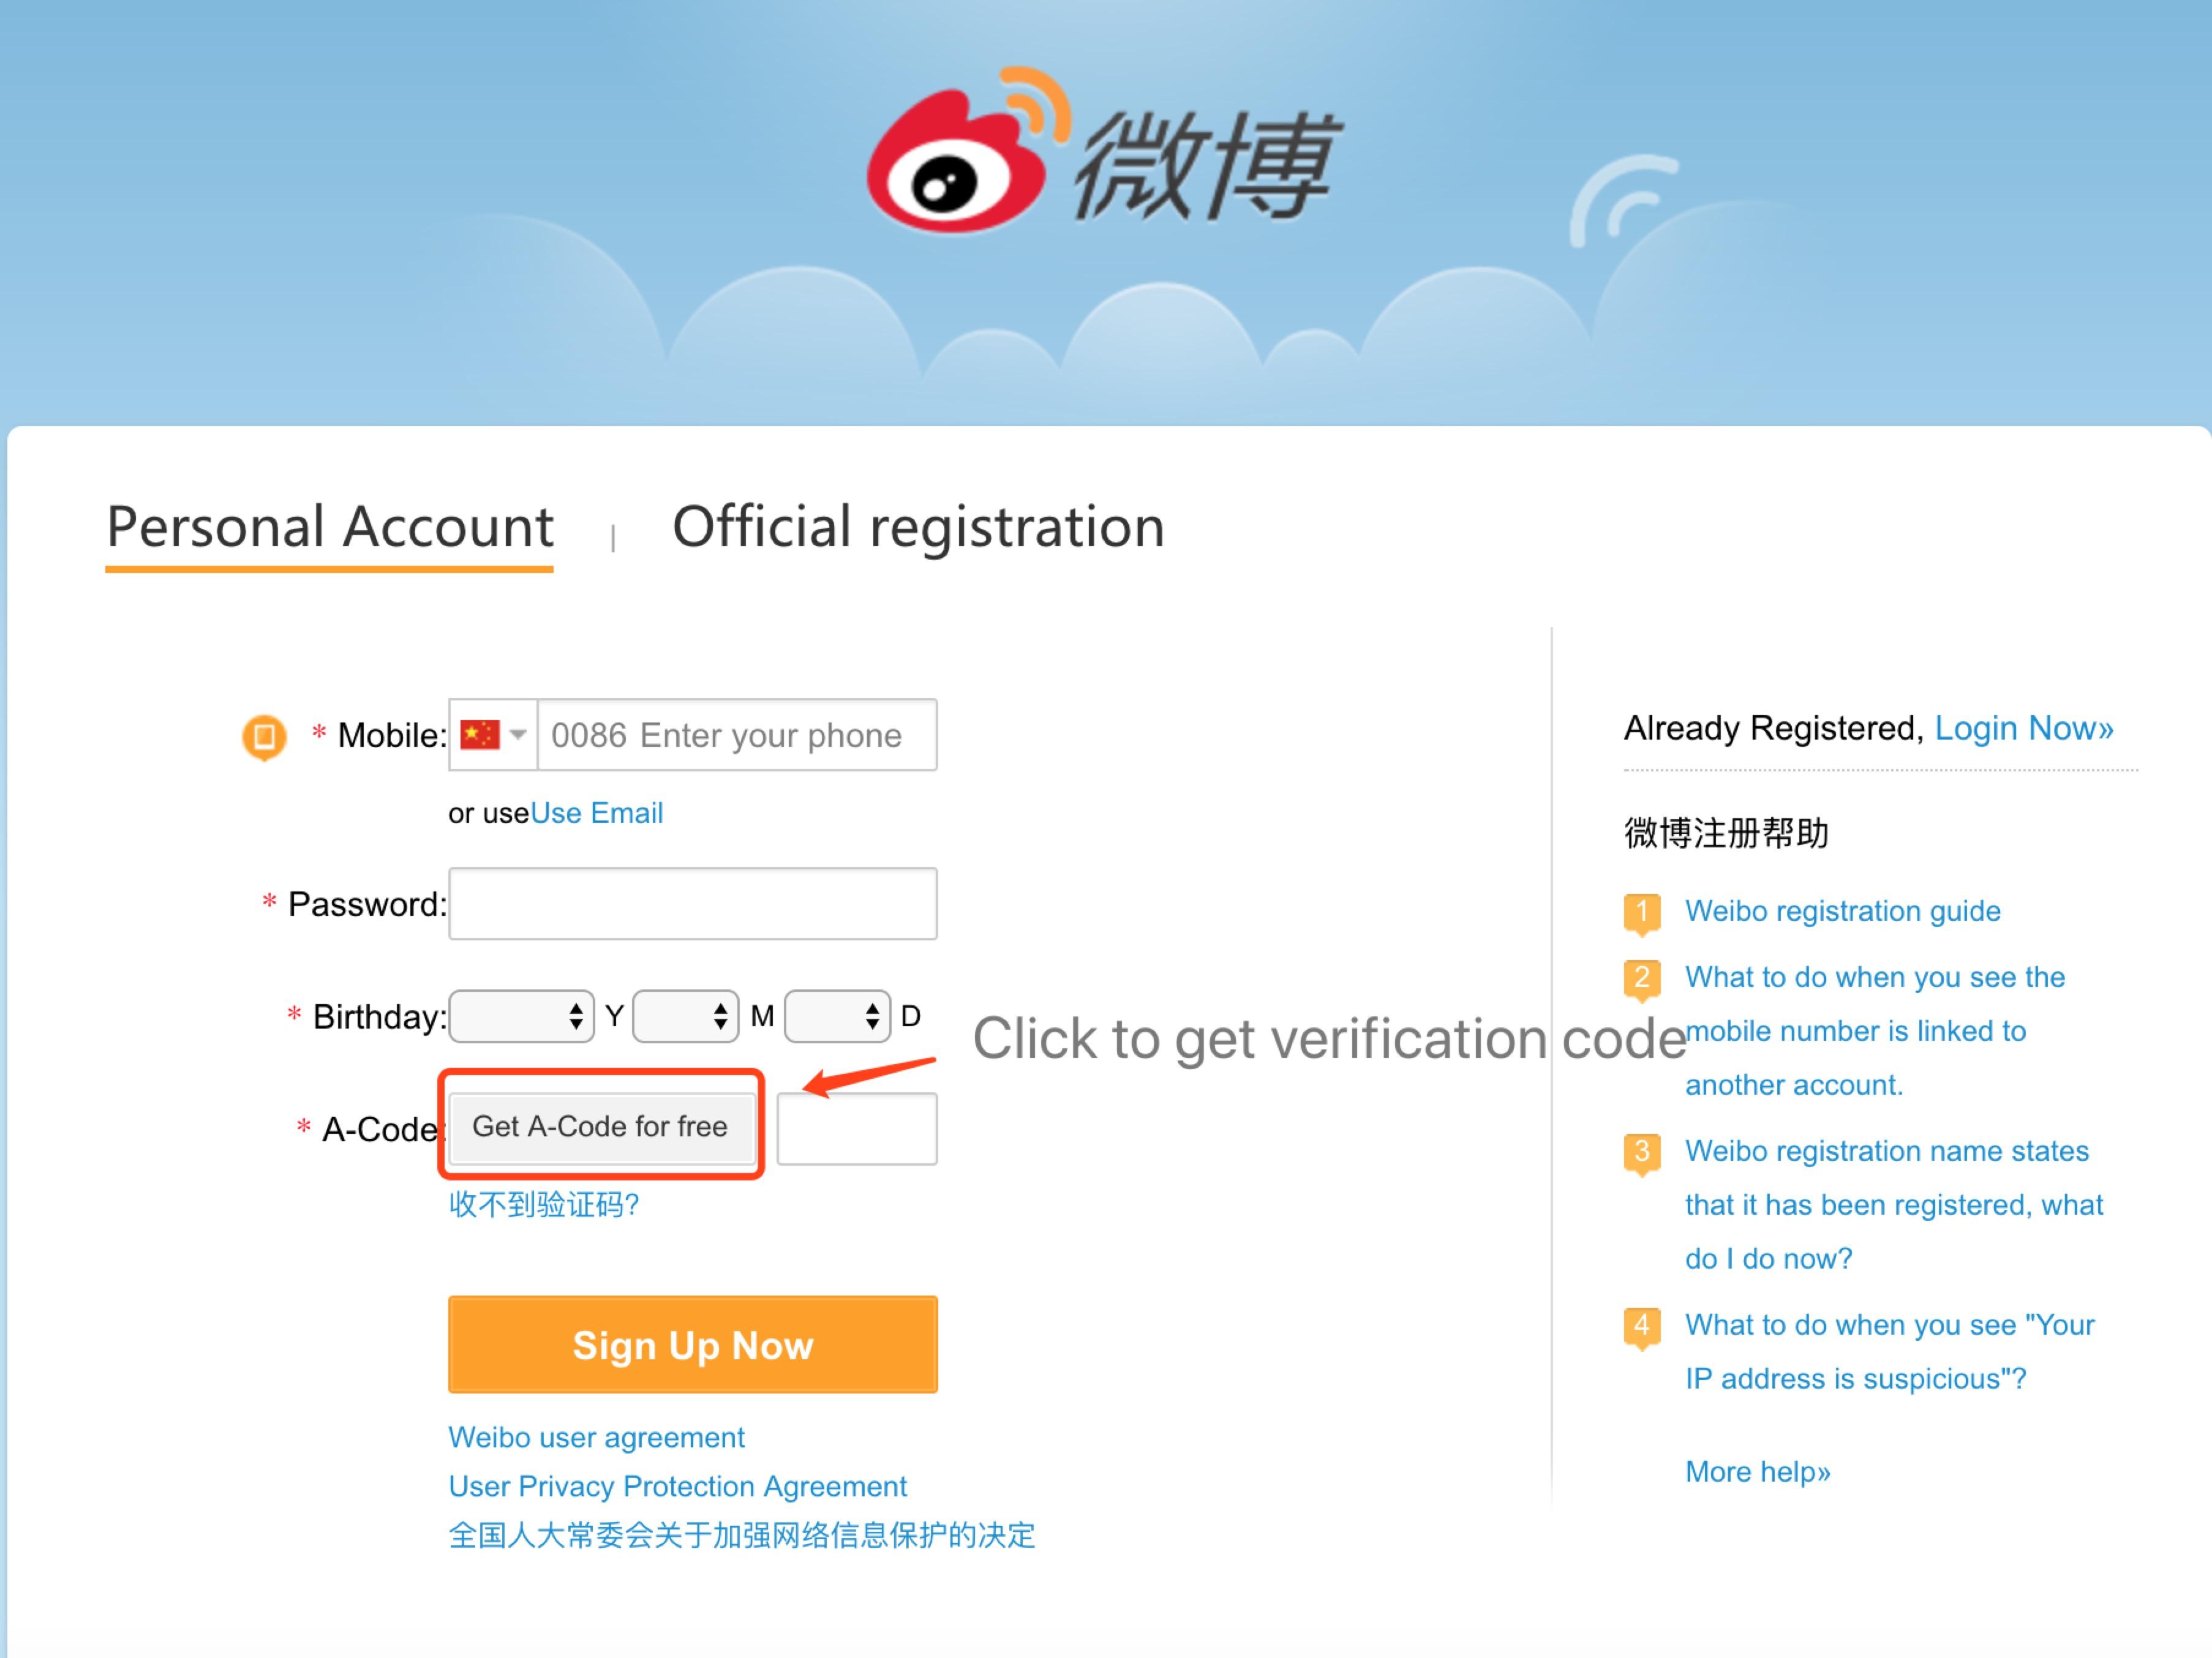 How do I register for a Weibo account?